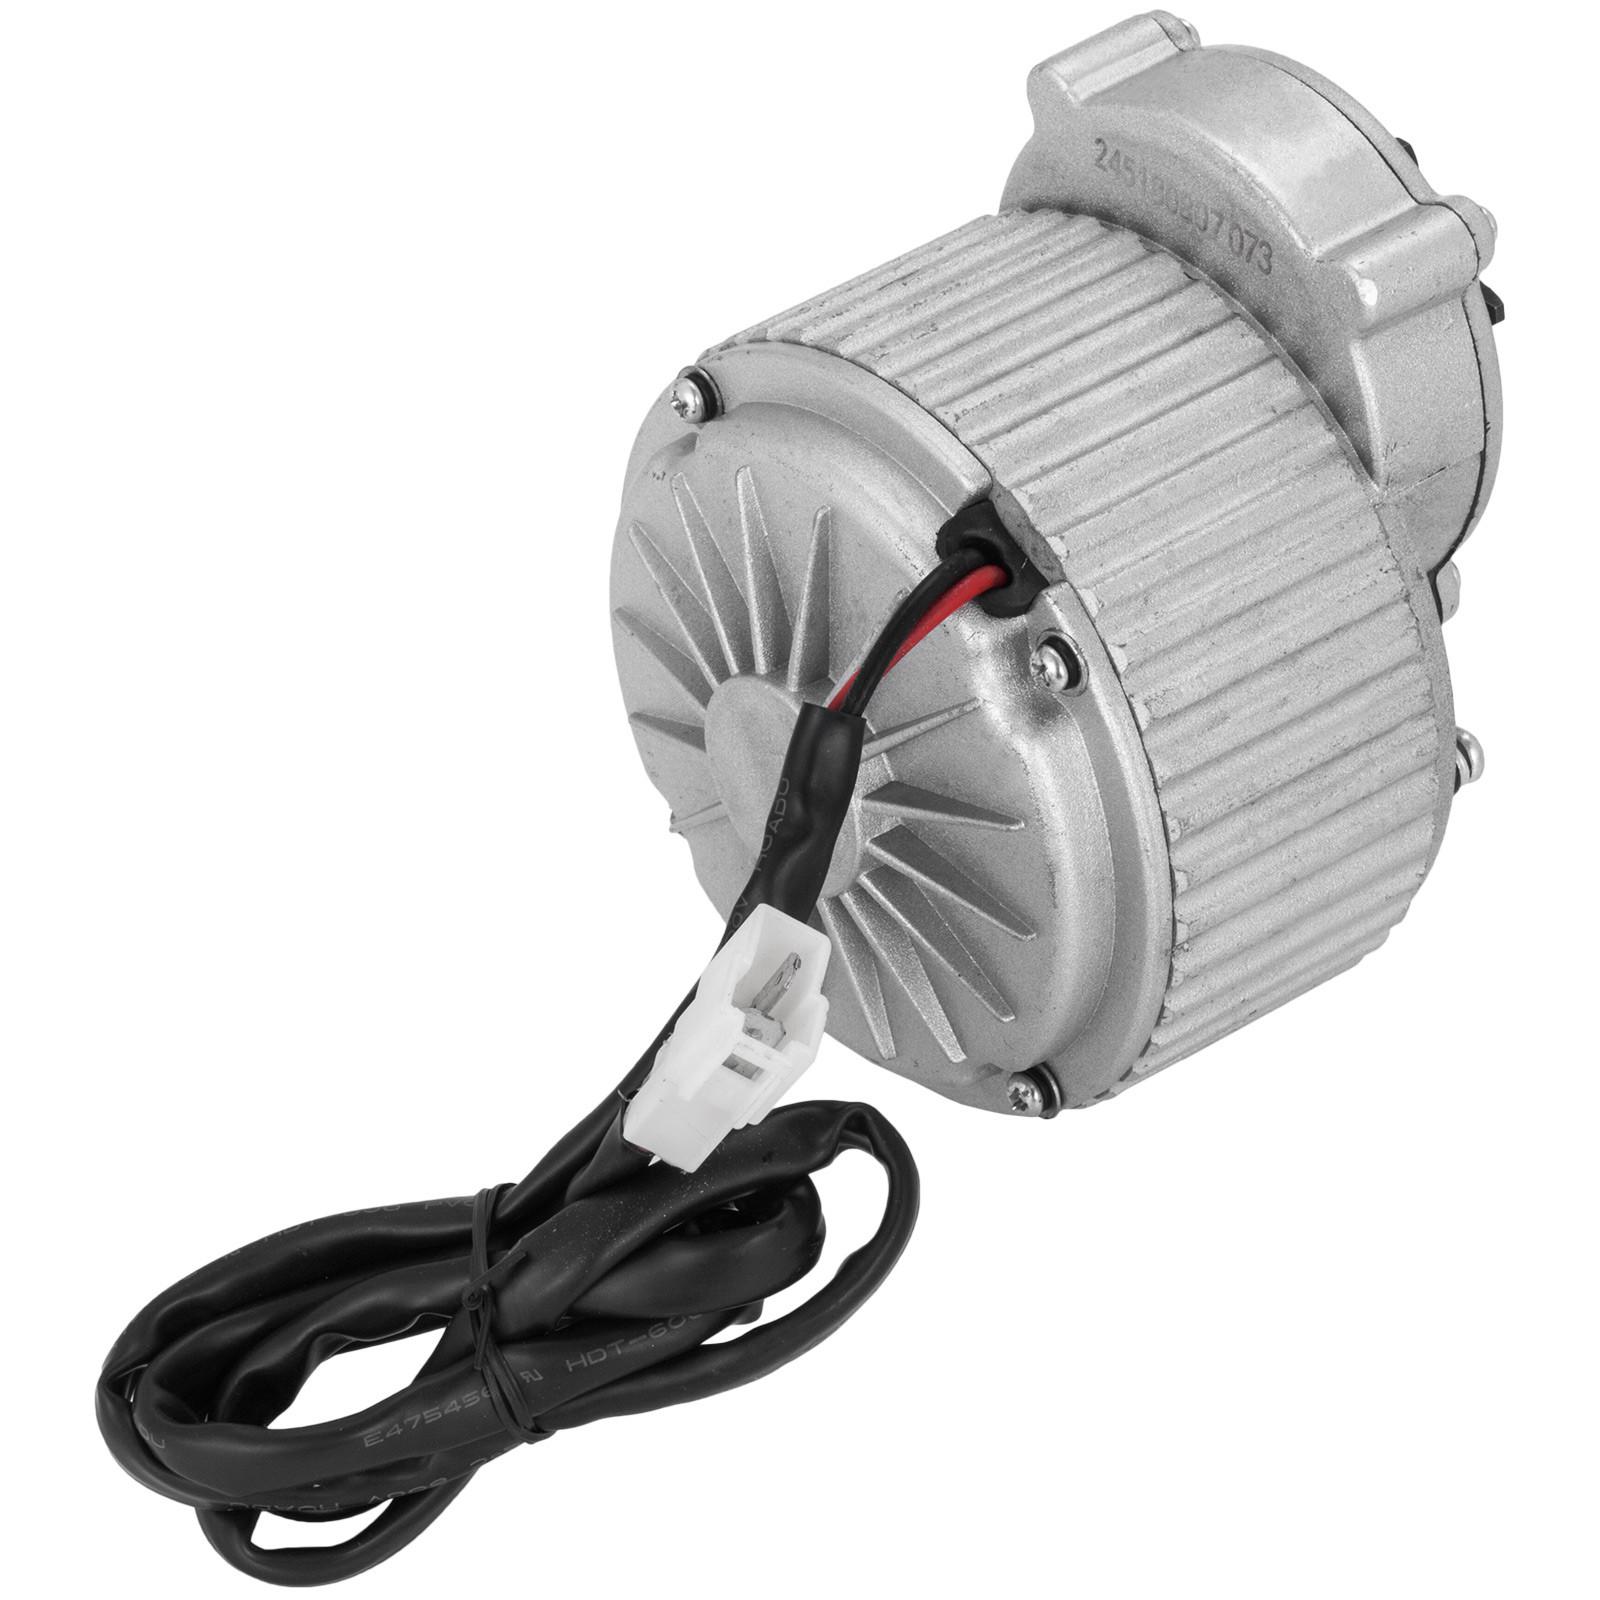 DC-electric-motor-12-60V-150W-2KW-for-scooter-bike-go-kart-minibike-e-ATV thumbnail 64